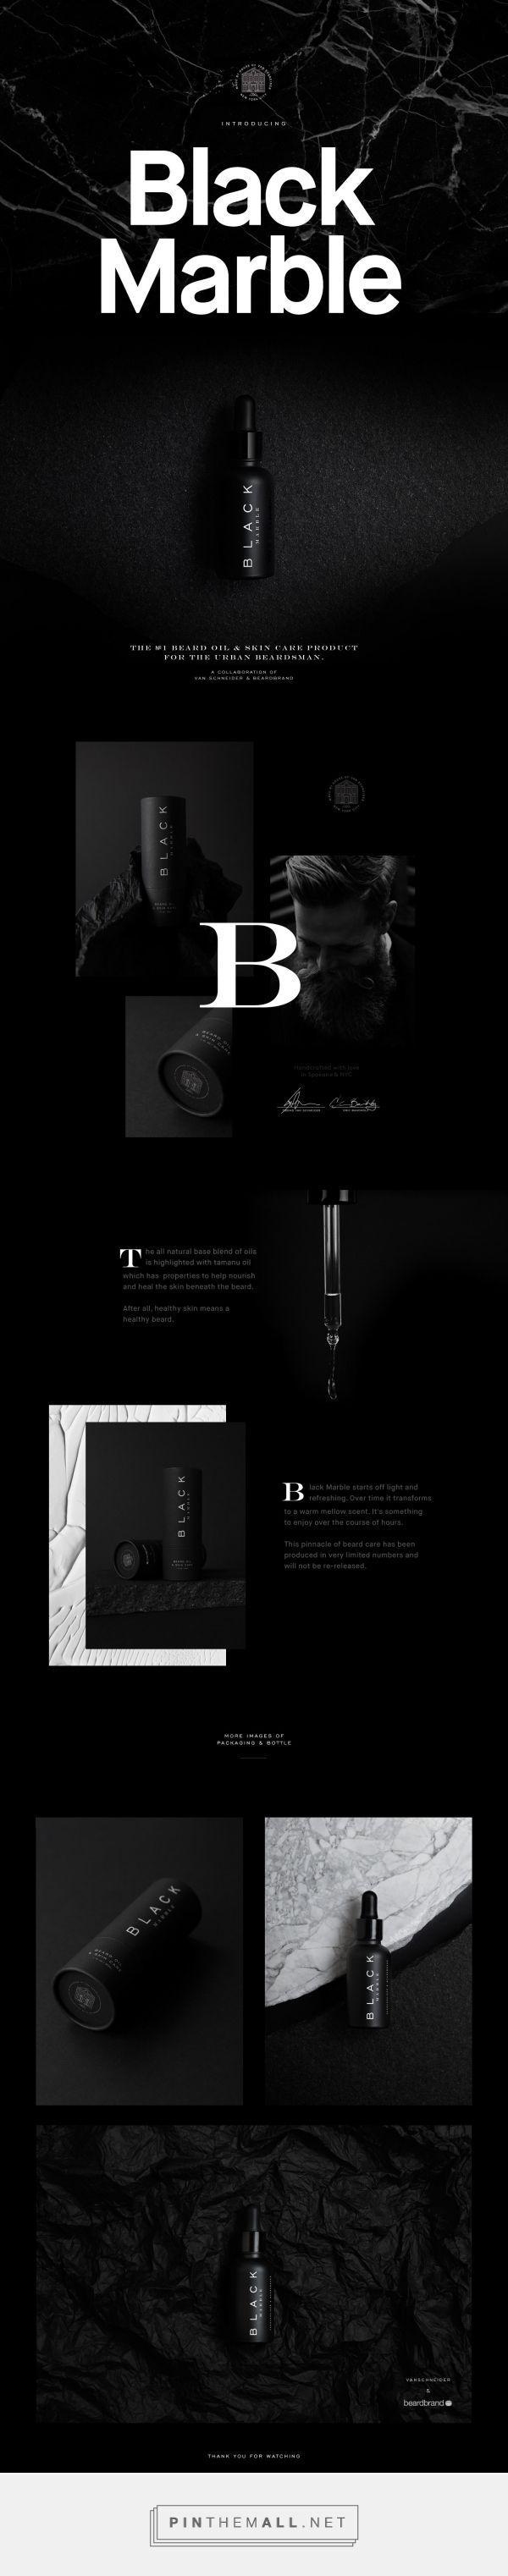 Black Marble Beard Oil Branding and Packaging by Tobias Van Schneider | Fivestar Branding Agency – Design and Branding Agency & Curated Inspiration Gallery